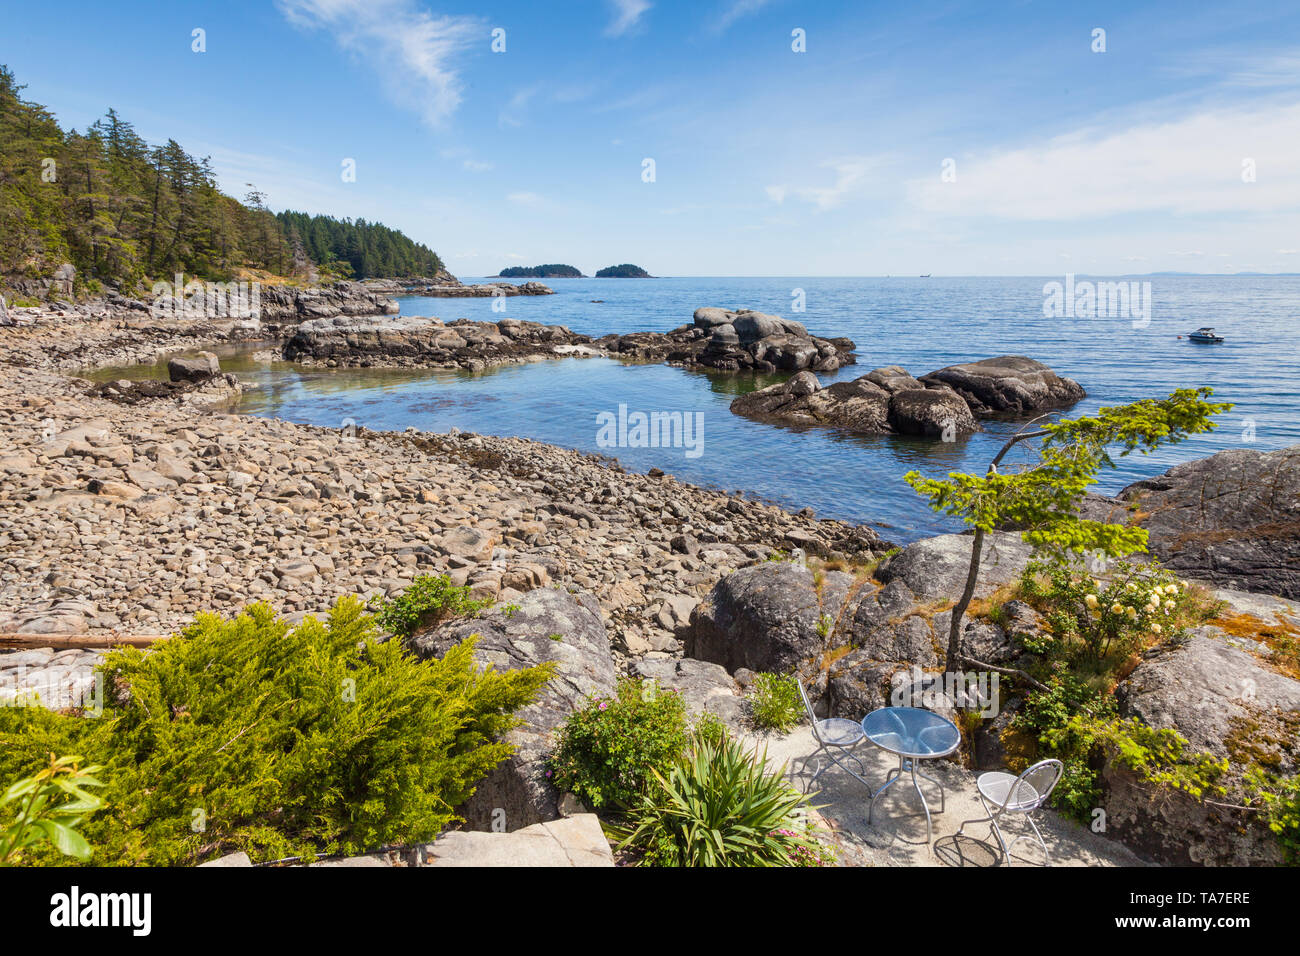 Beach scenery from the Pointhouse Suites luxury accomodation on the Sunshine Coast of British Columbia - Stock Image